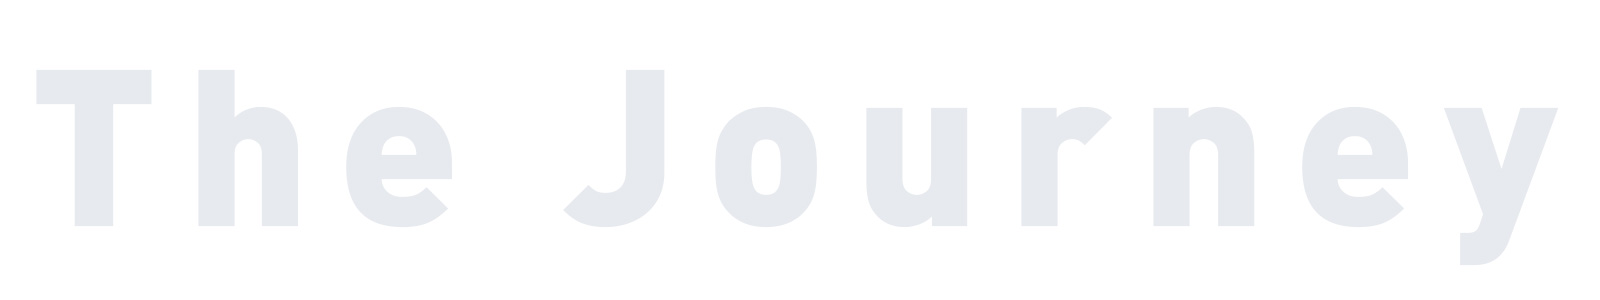 JCLeRoux_Layout_3